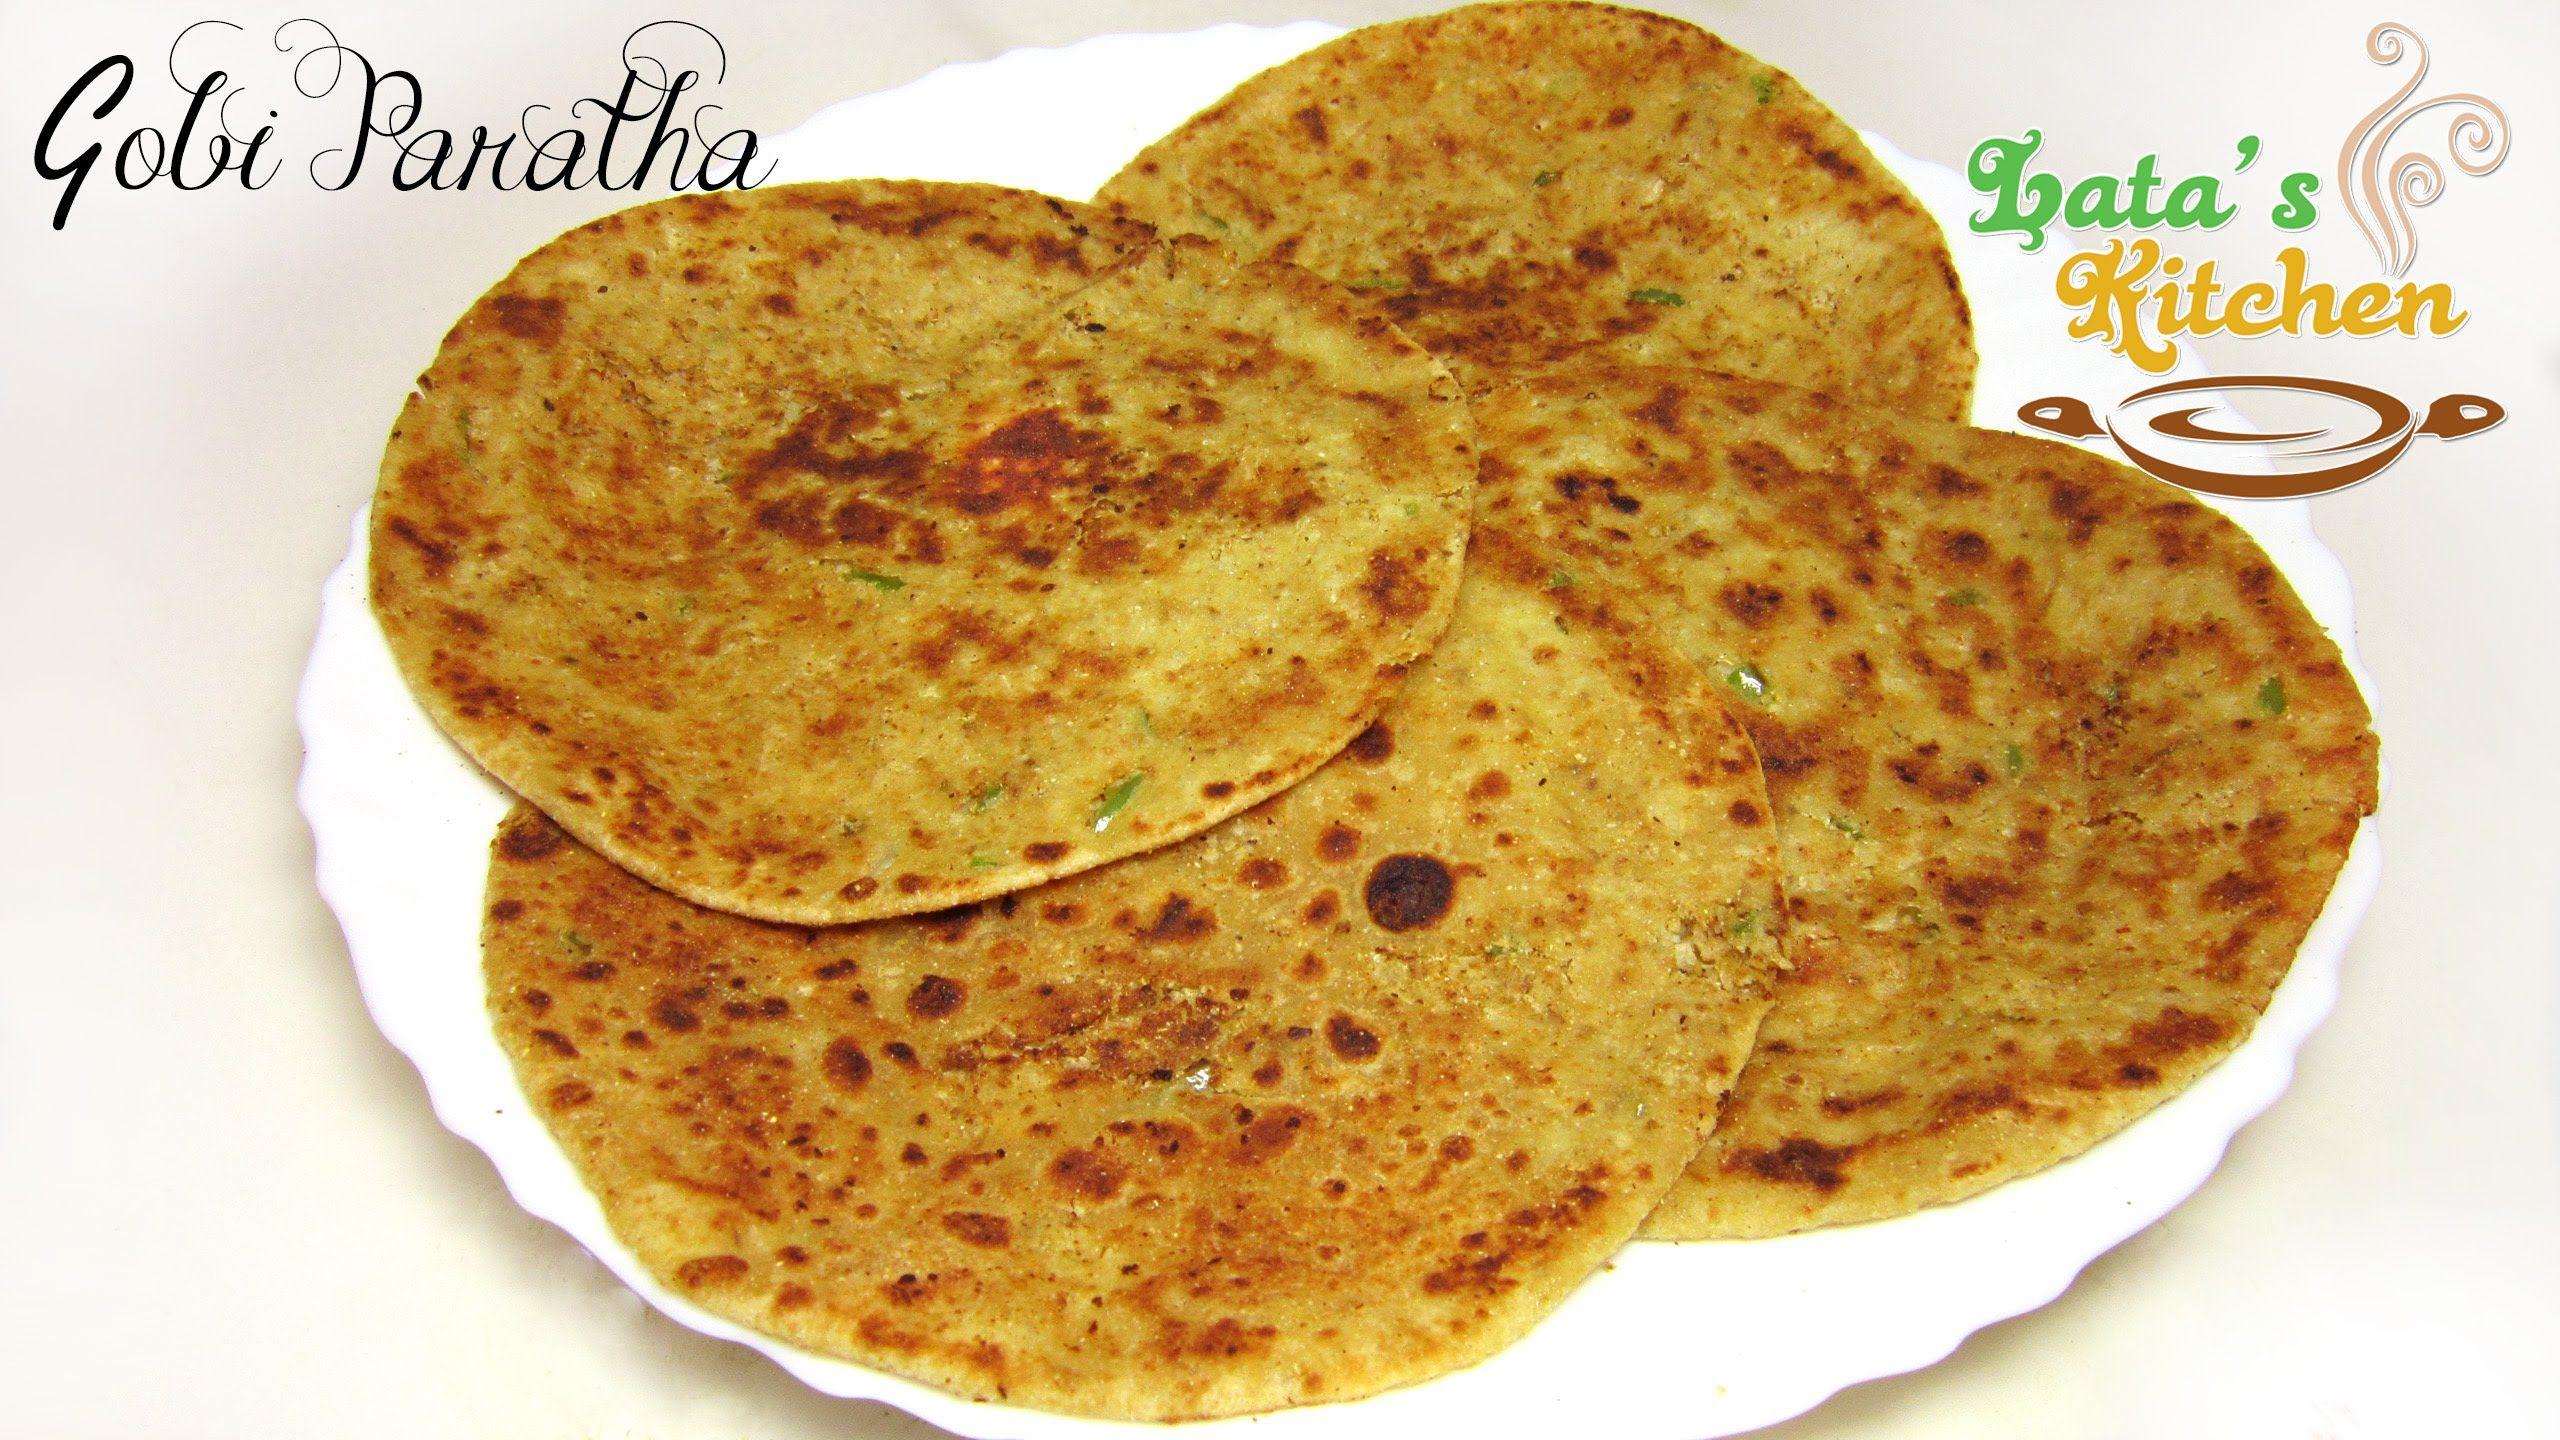 Gobi paratha recipe indian vegetarian recipe video in hindi with gobi paratha recipe indian vegetarian recipe video in hindi with english subtitles forumfinder Gallery